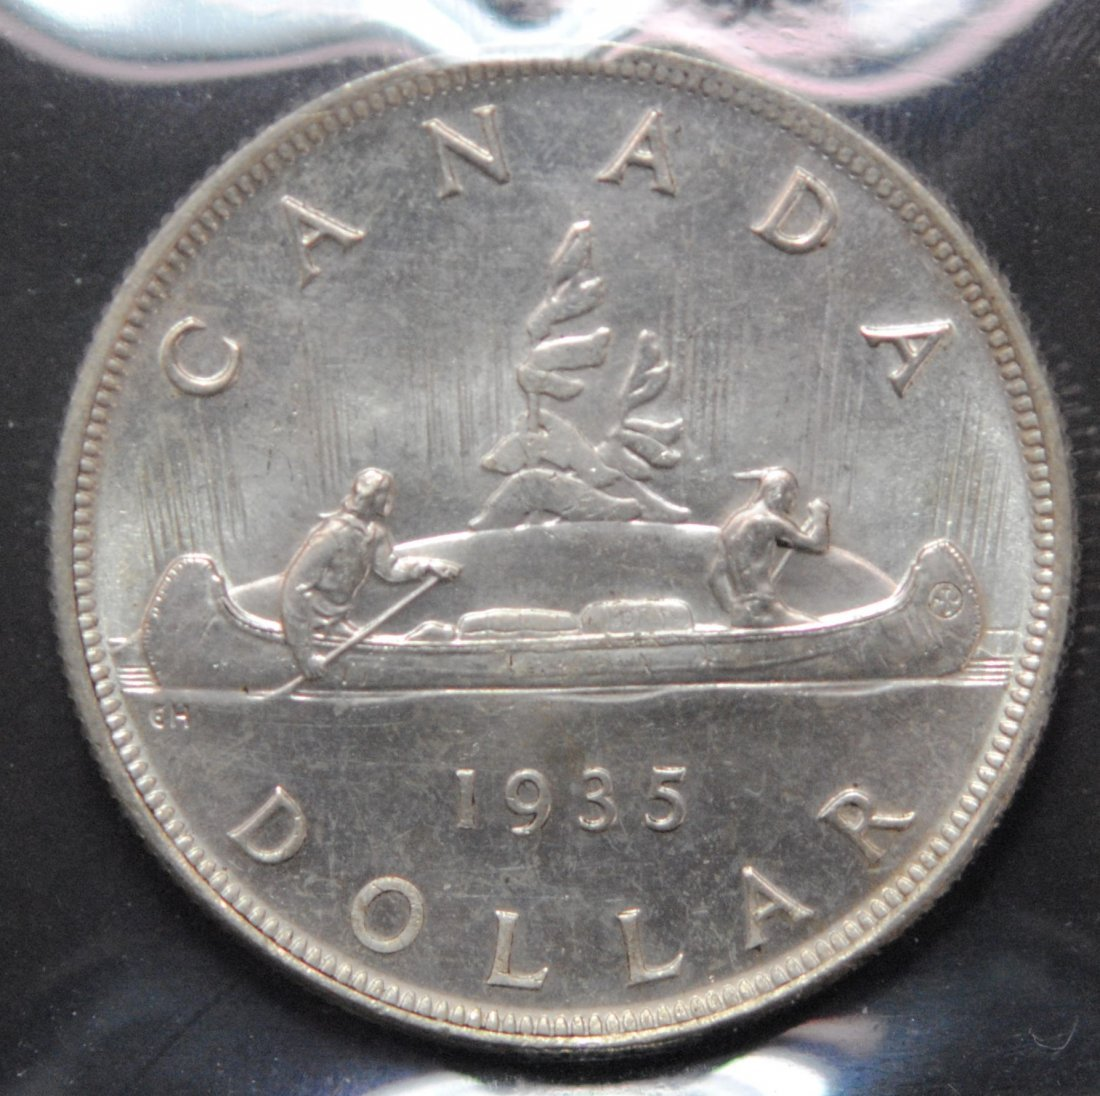 Canada 1935 Dollar ICCS MS64 - 3